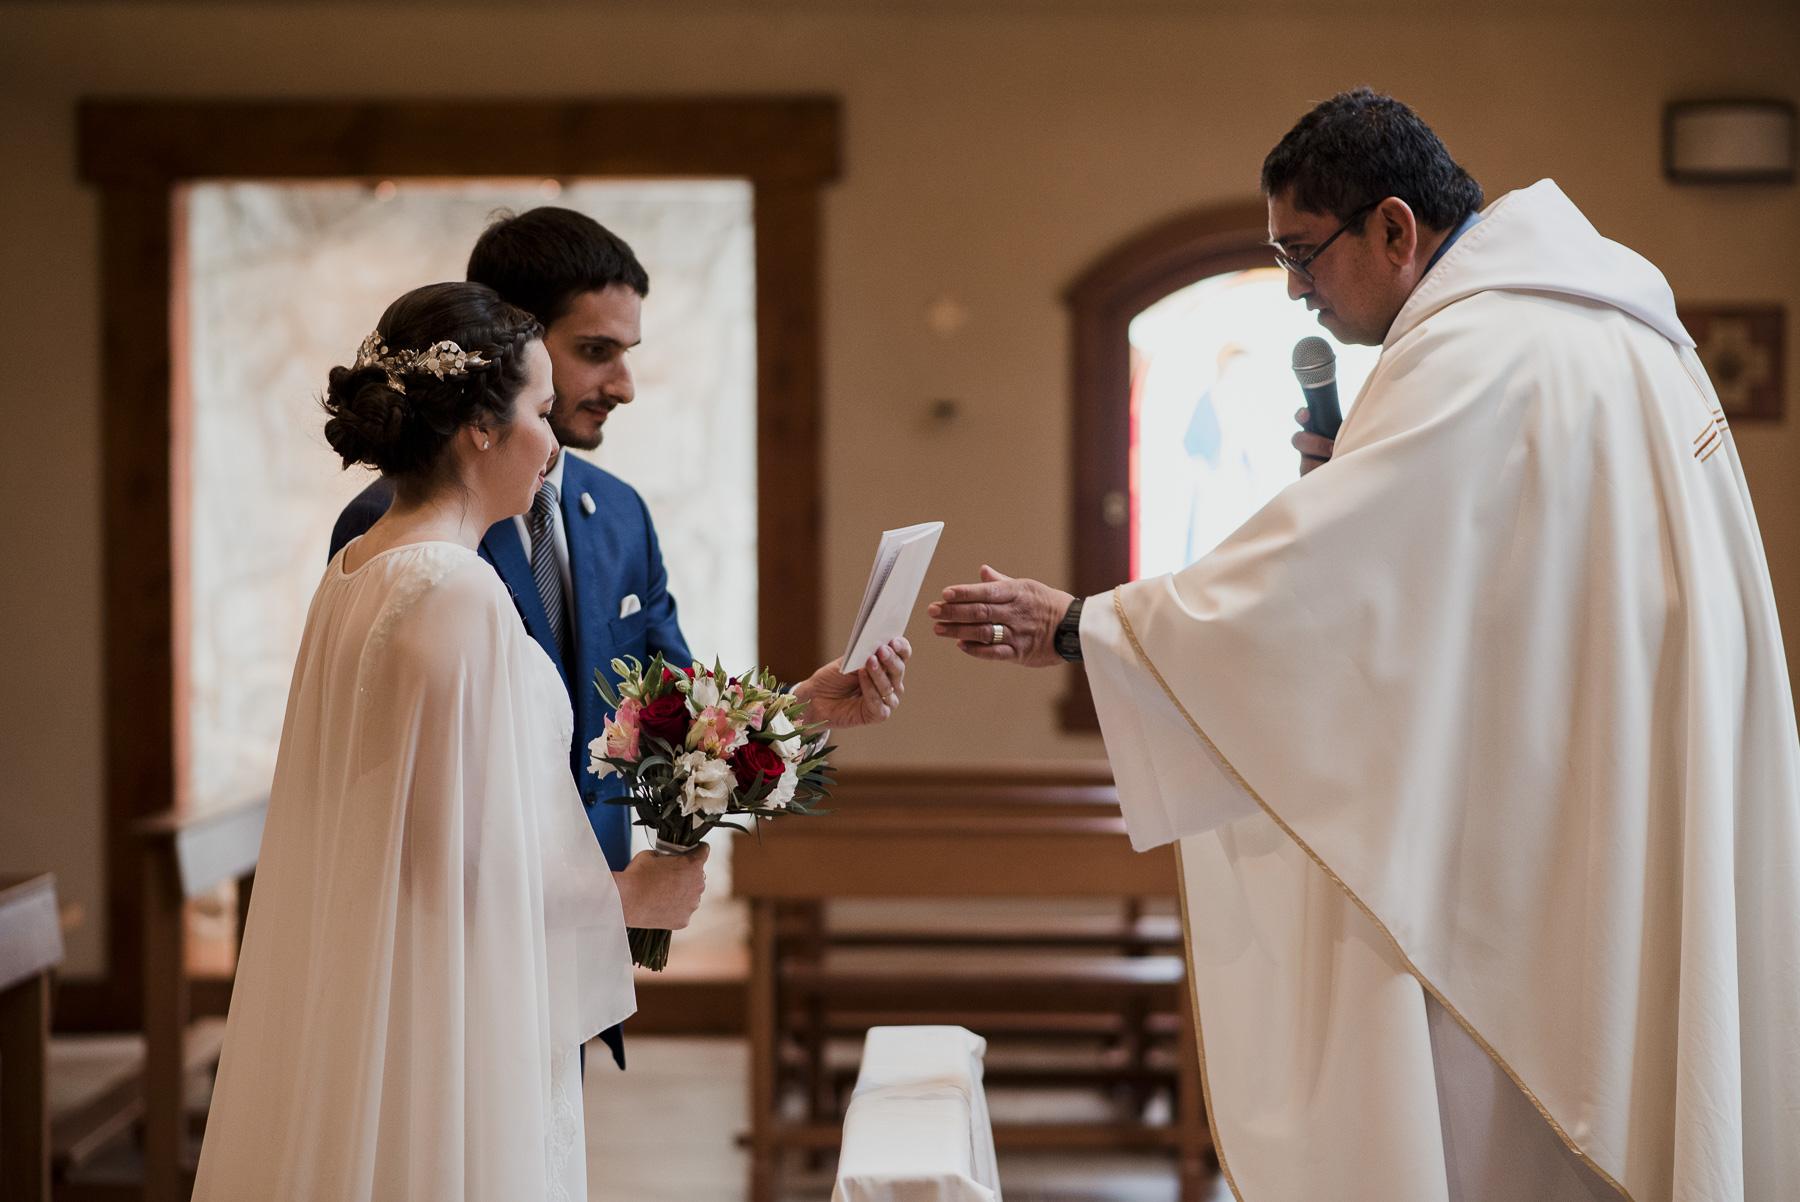 casamiento karen y gabi en bariloche por emilia gualdoni fotografia